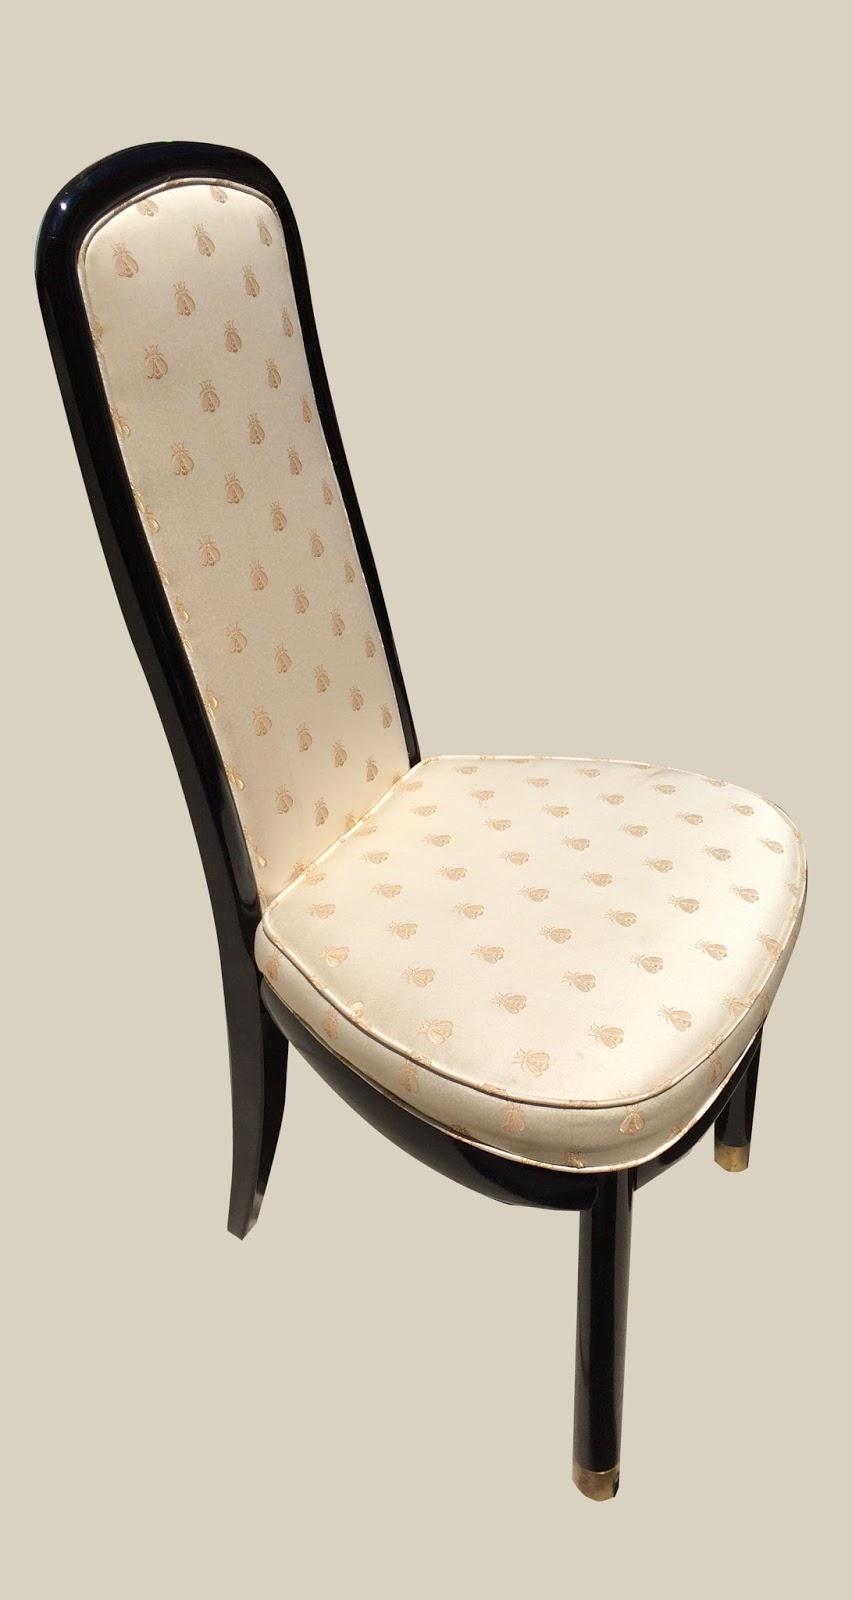 6 Henredon Chairs - $275 SOLD & Uhuru Furniture u0026 Collectibles: 6 Henredon Chairs - $275 SOLD